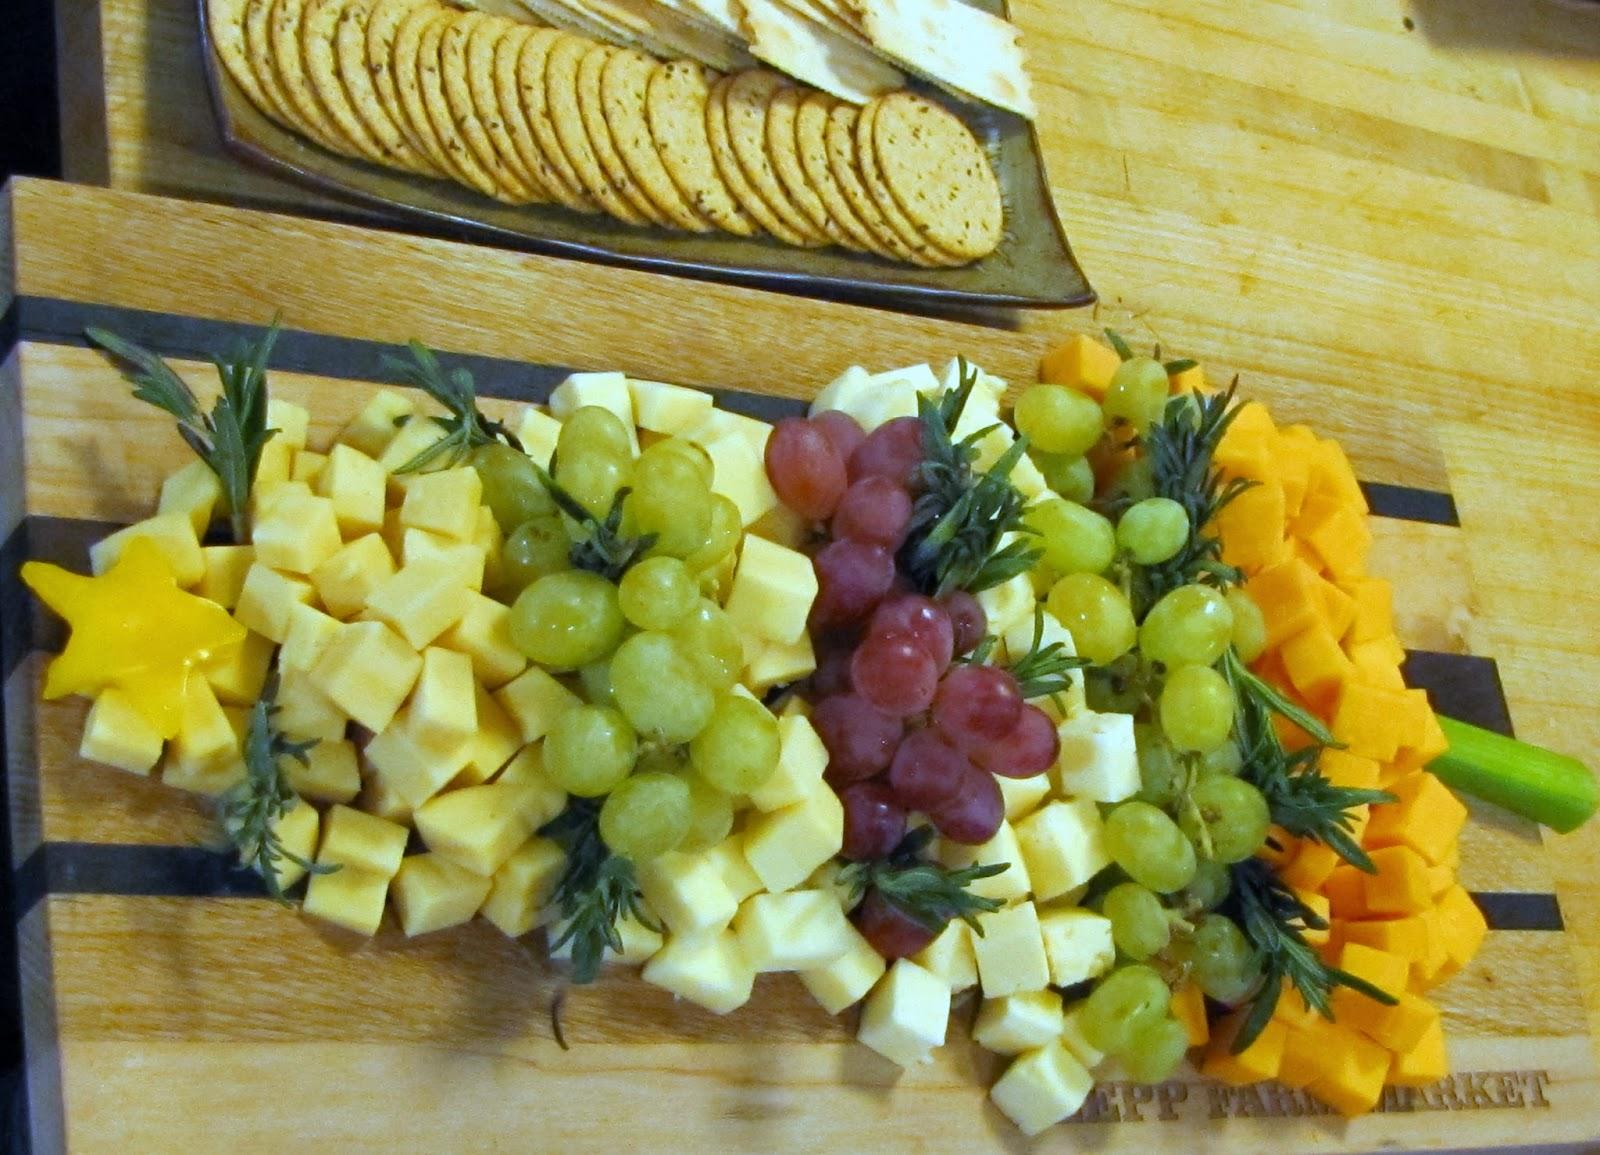 Mennonite Girls Can Cook: Christmas Tree Cheese Platter